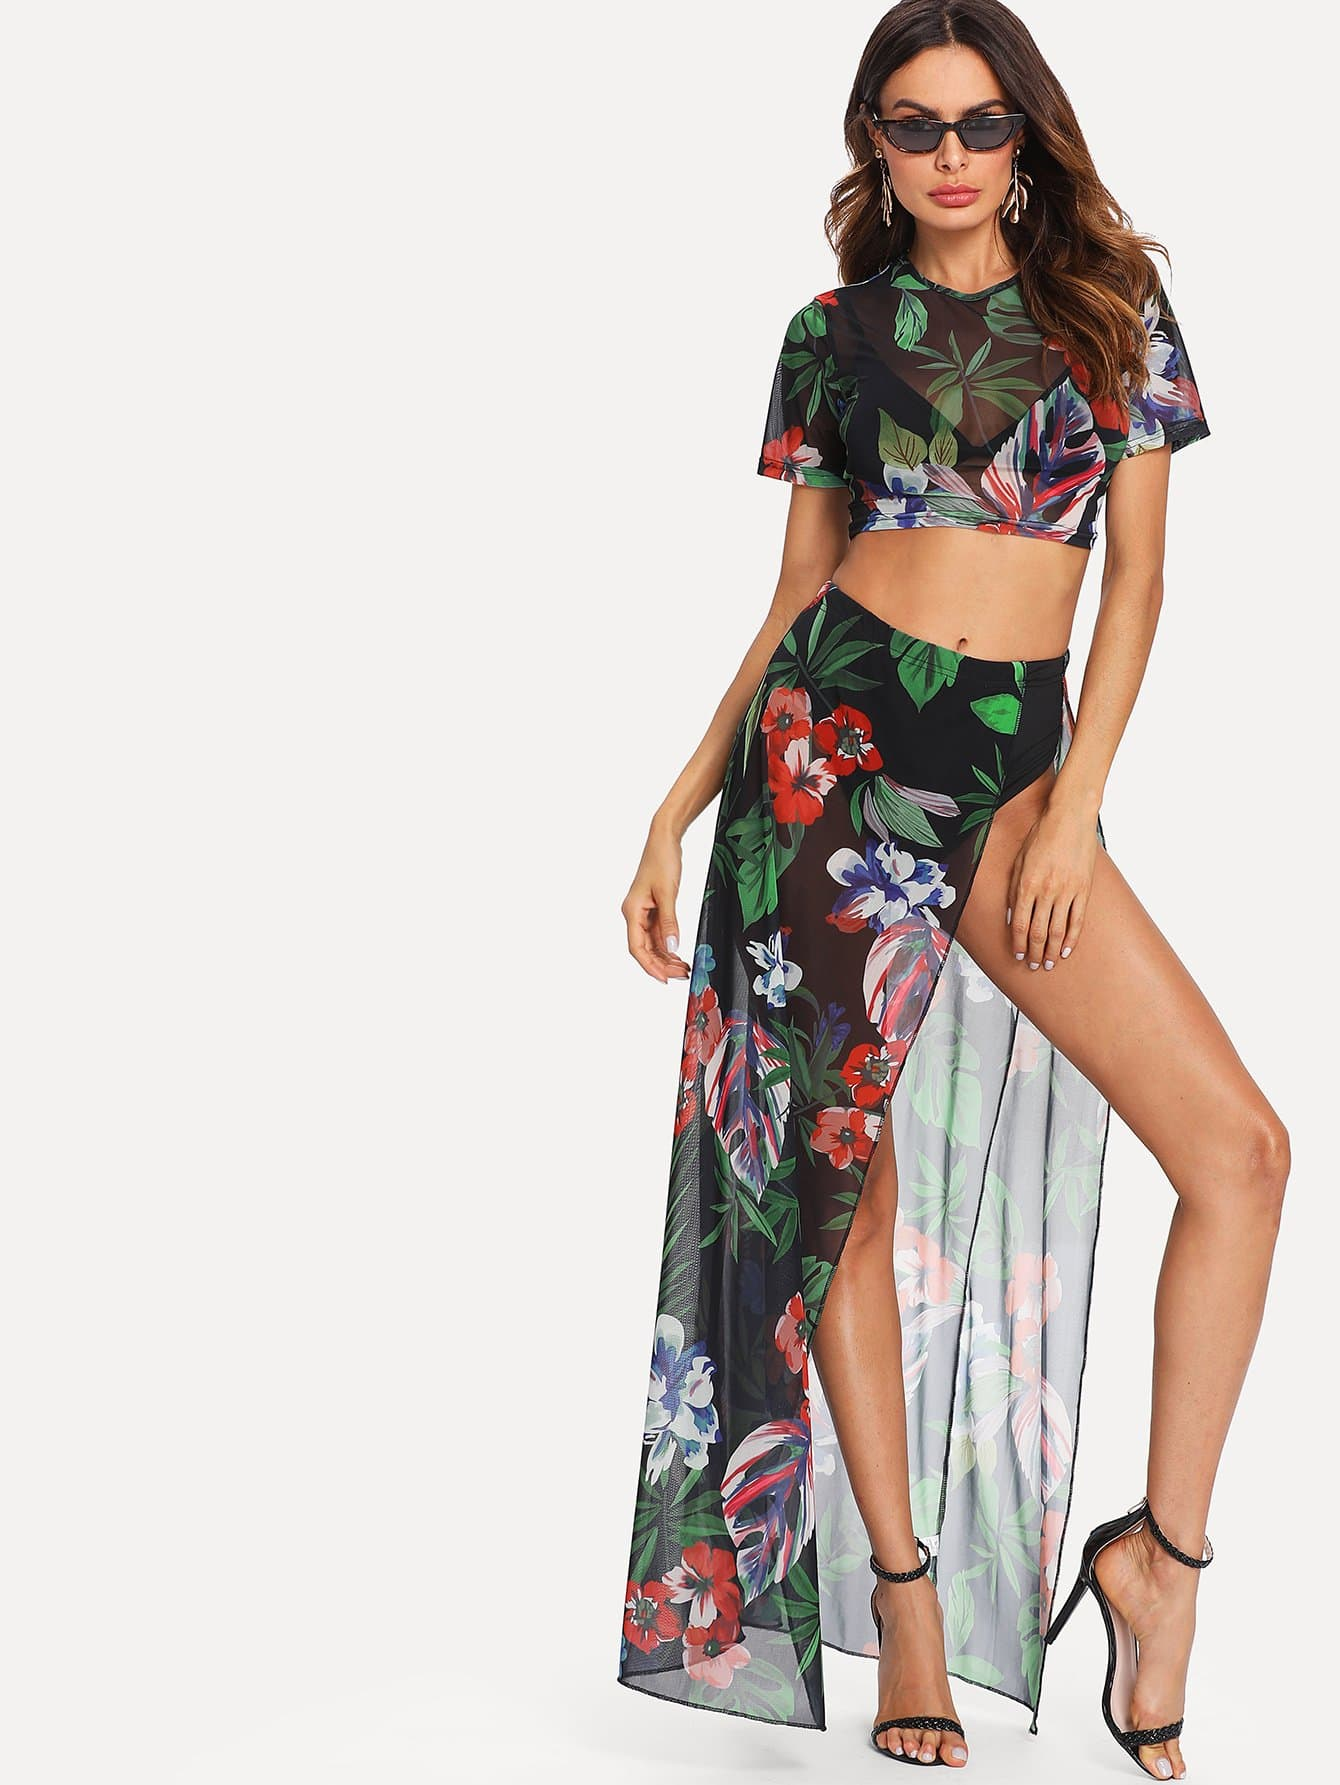 Floral Print Sheer Mesh Crop Top With Skirt star sequin sheer mesh top